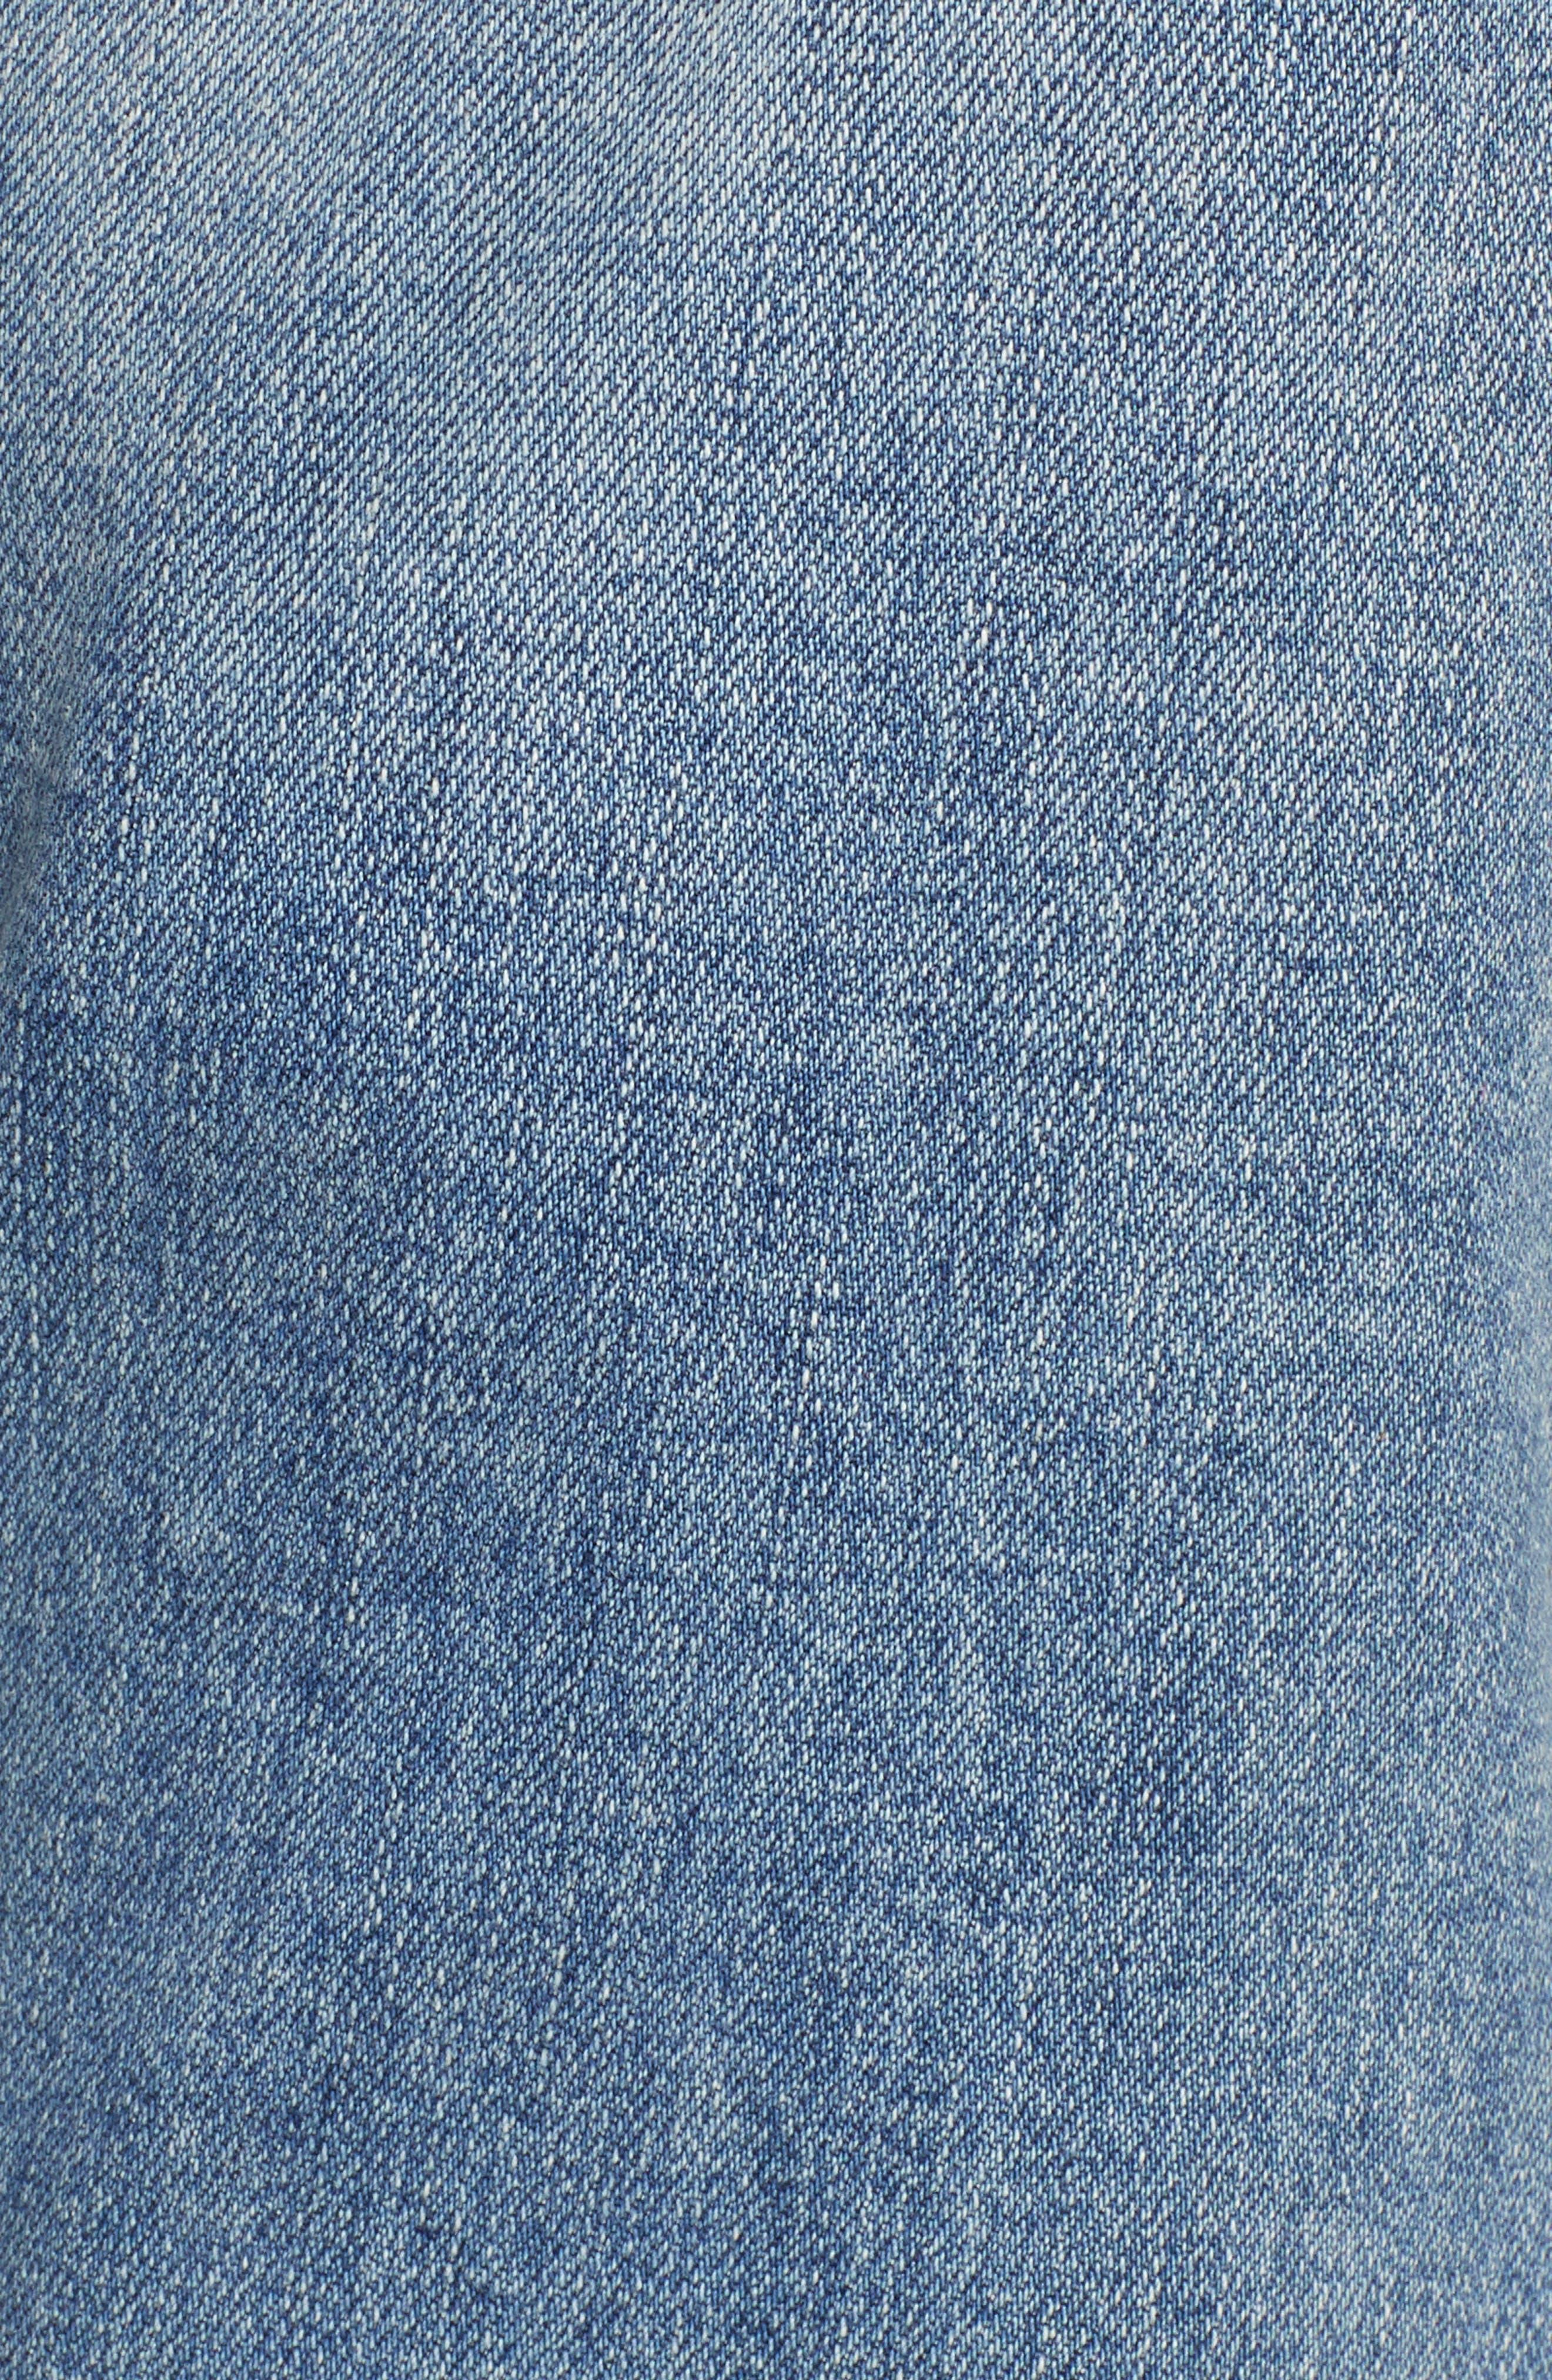 CITIZENS OF HUMANITY, Emerson Crop Slim Fit Boyfriend Jeans, Alternate thumbnail 6, color, MARINA